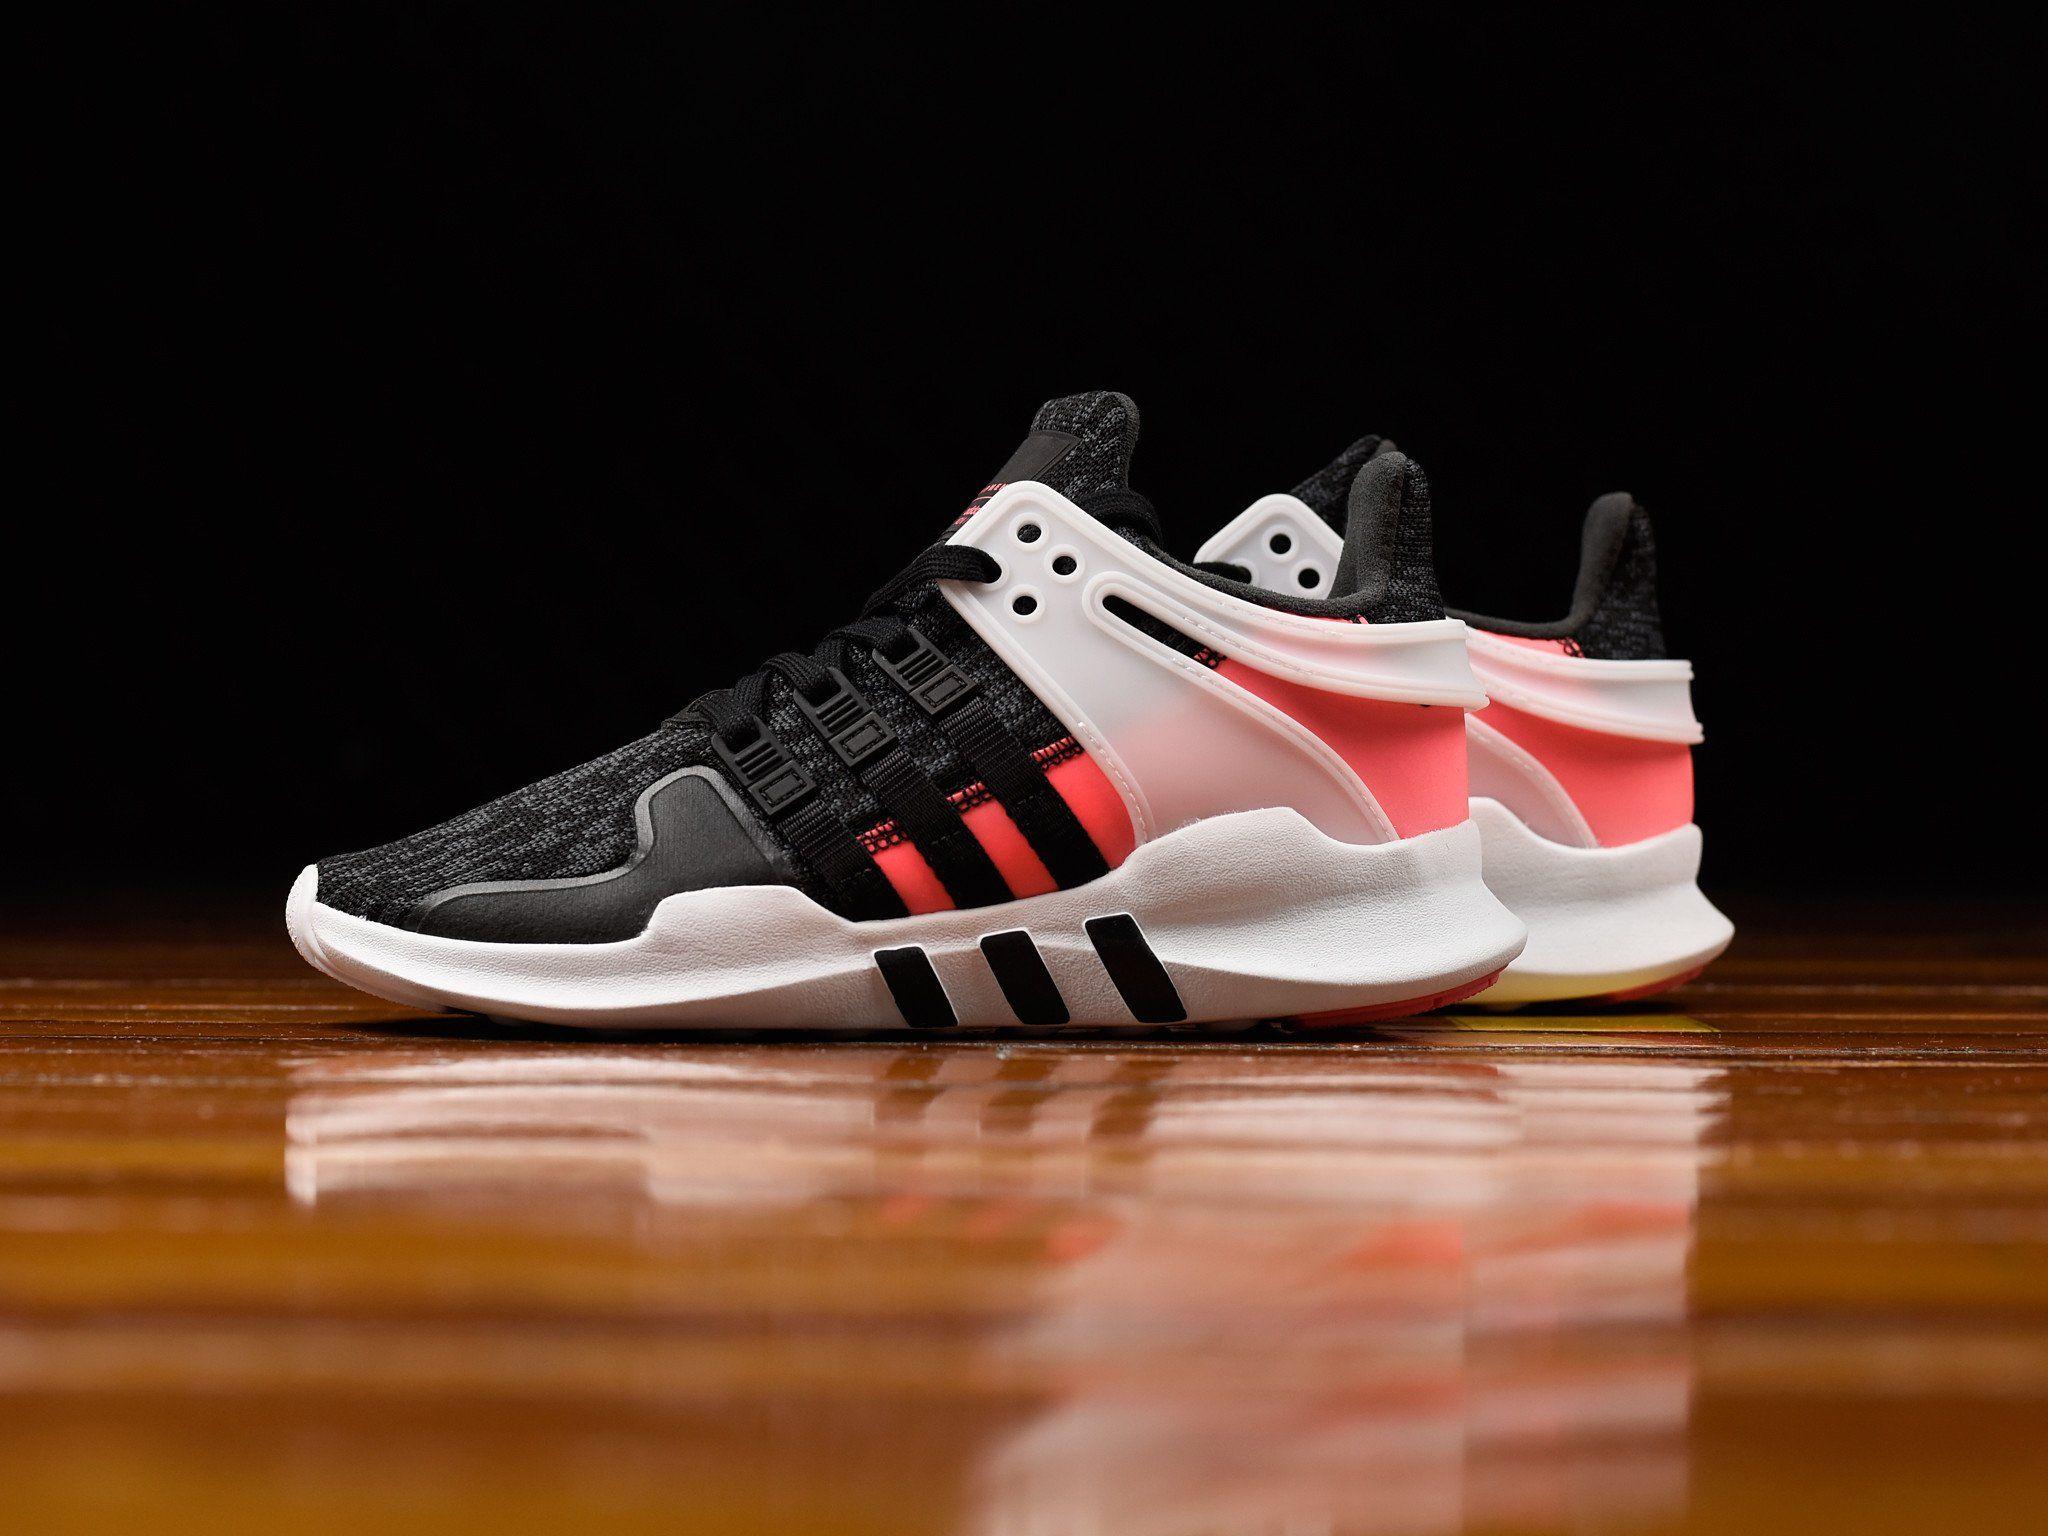 buy popular 34cdc 6bf3f Kid's Adidas EQT Support ADV J 'Turbo Red' [BB0543]   Adidas ...